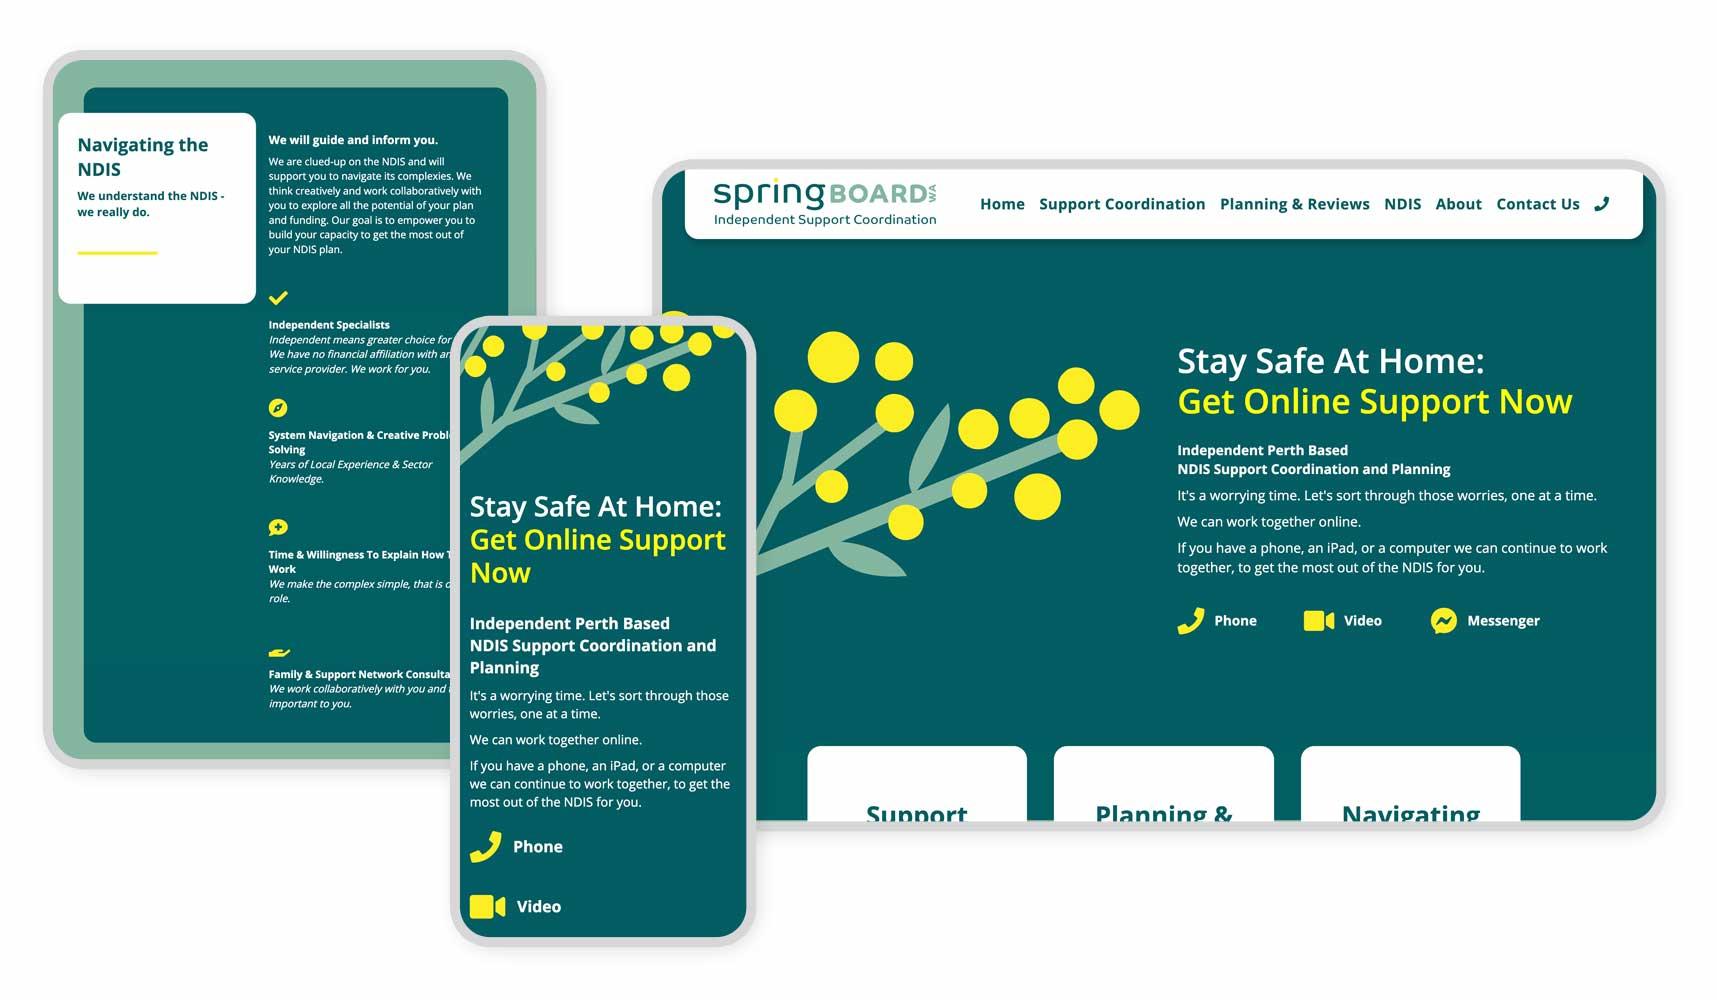 Springboard WA Responsive Graphic